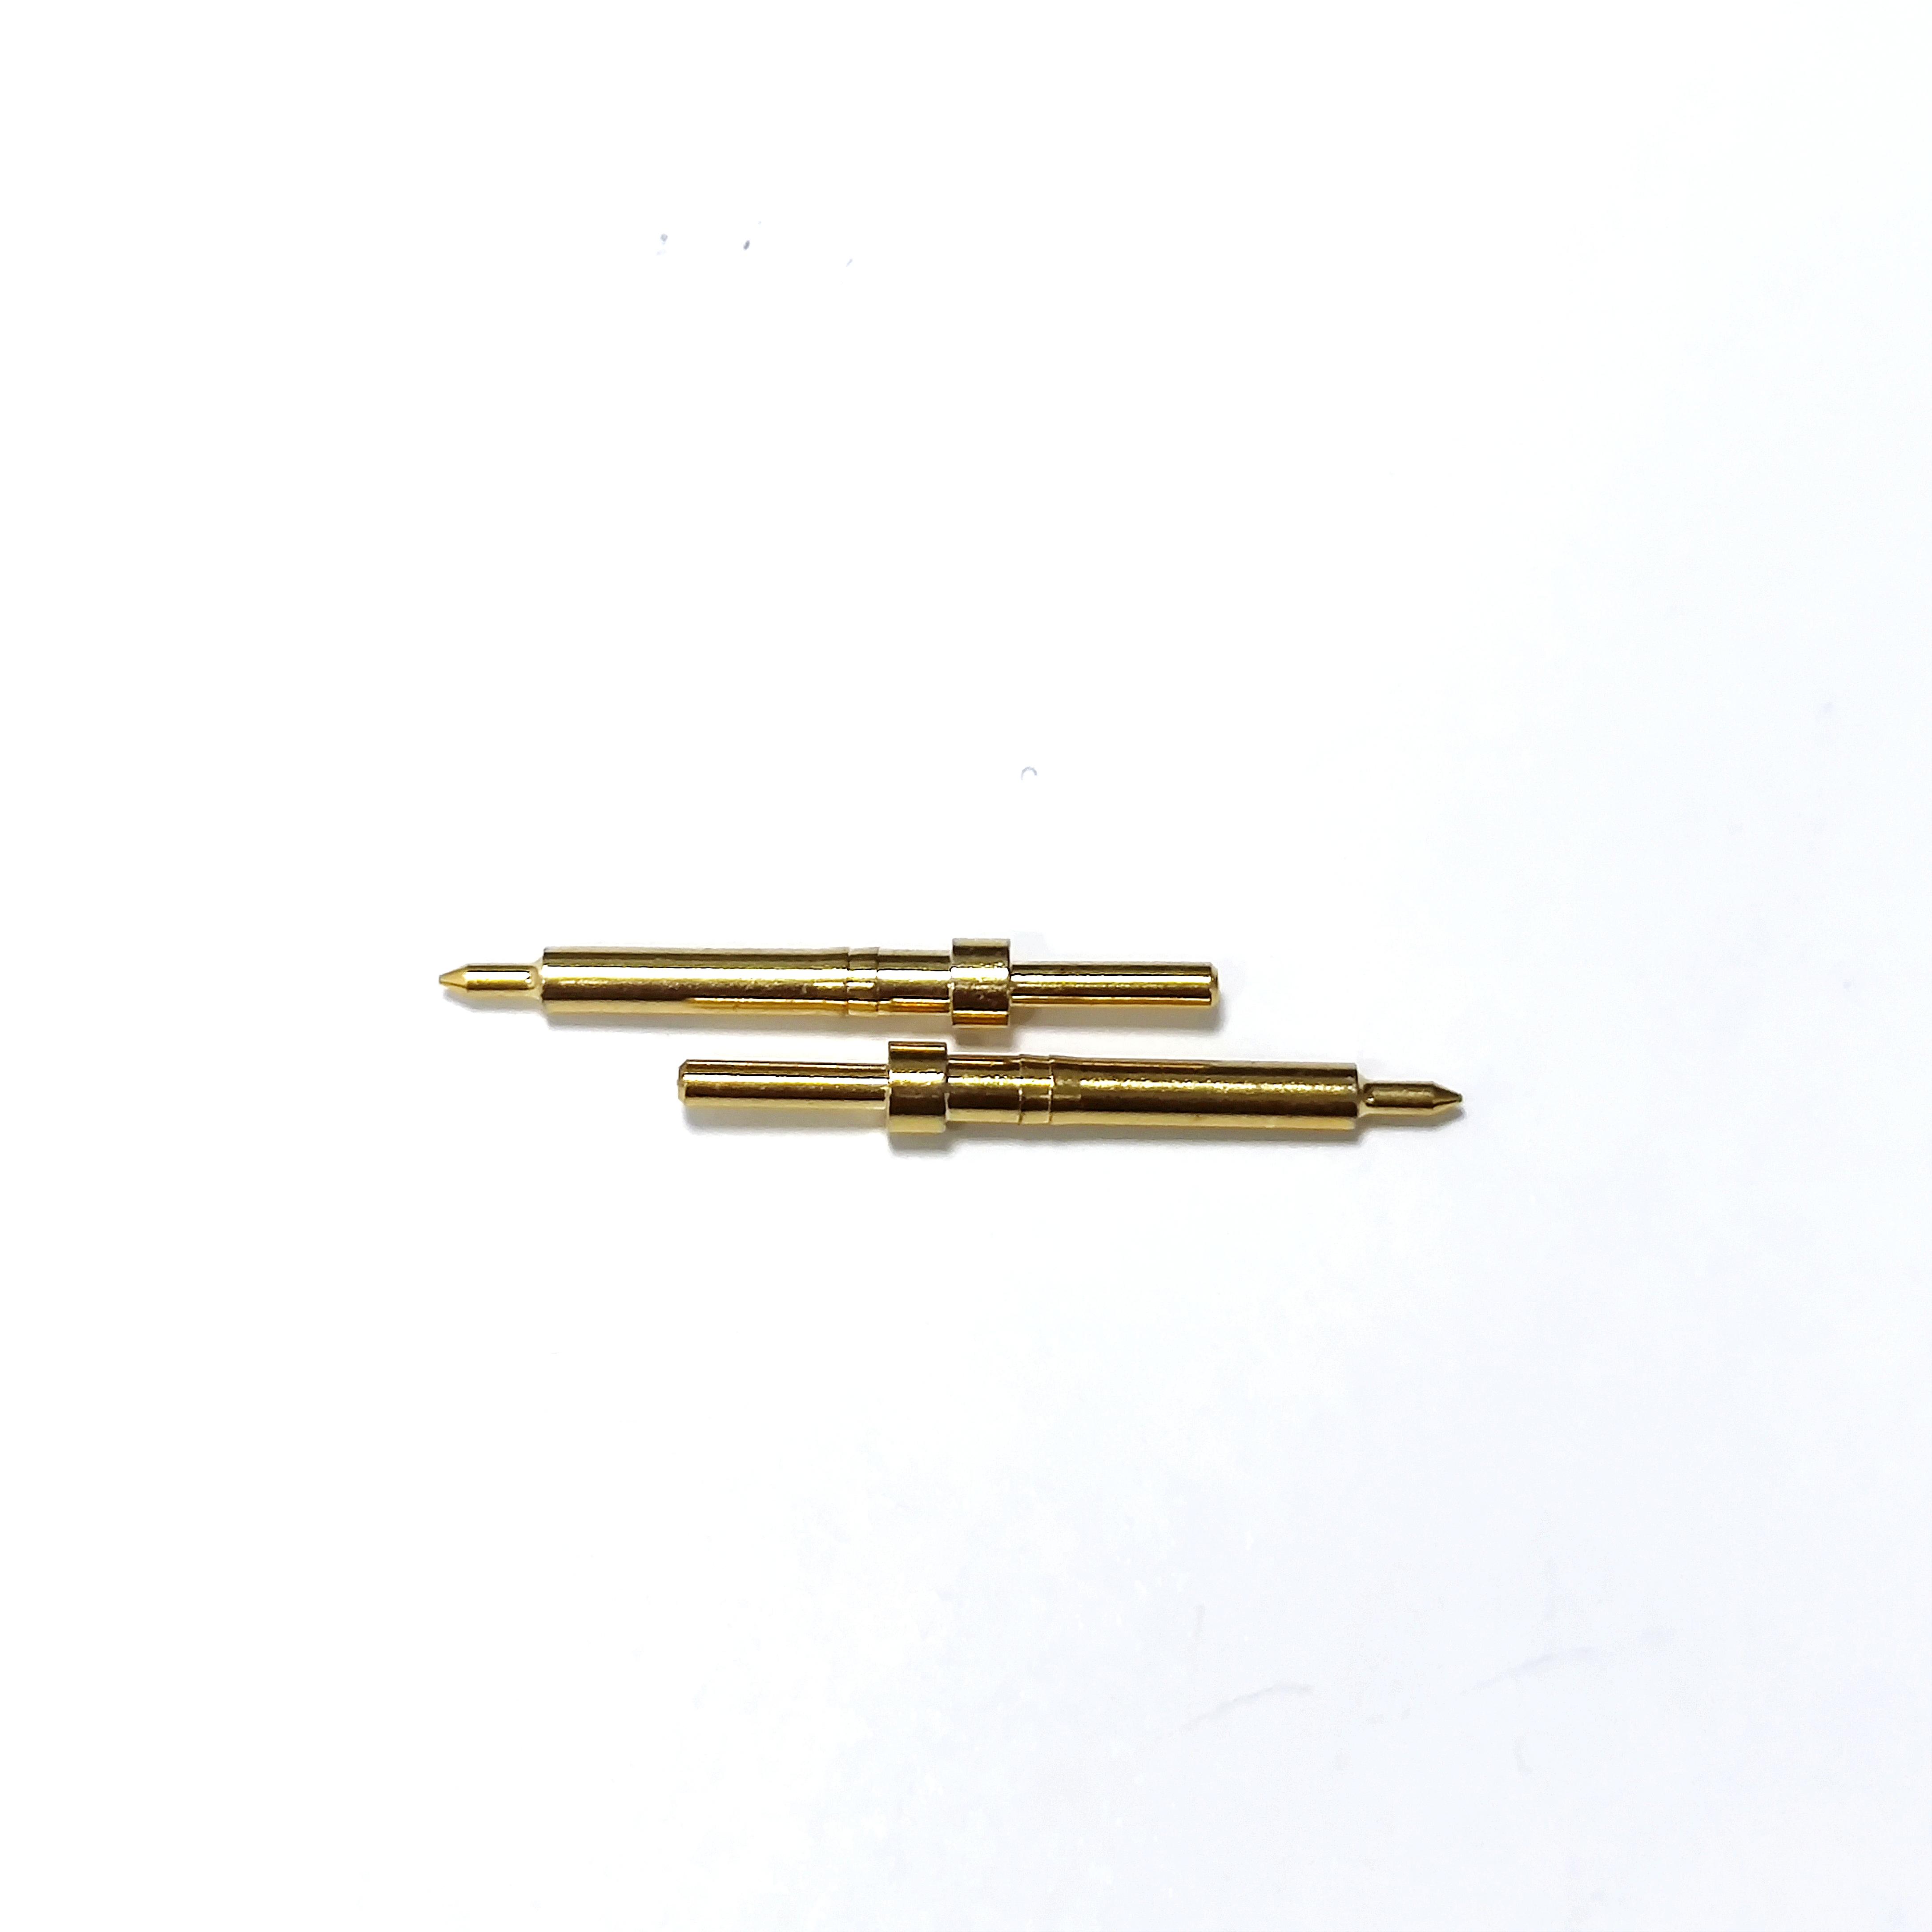 High Quality Machining Brass Cnc Part Machine Manufacturing Cnc Custom Metal Part